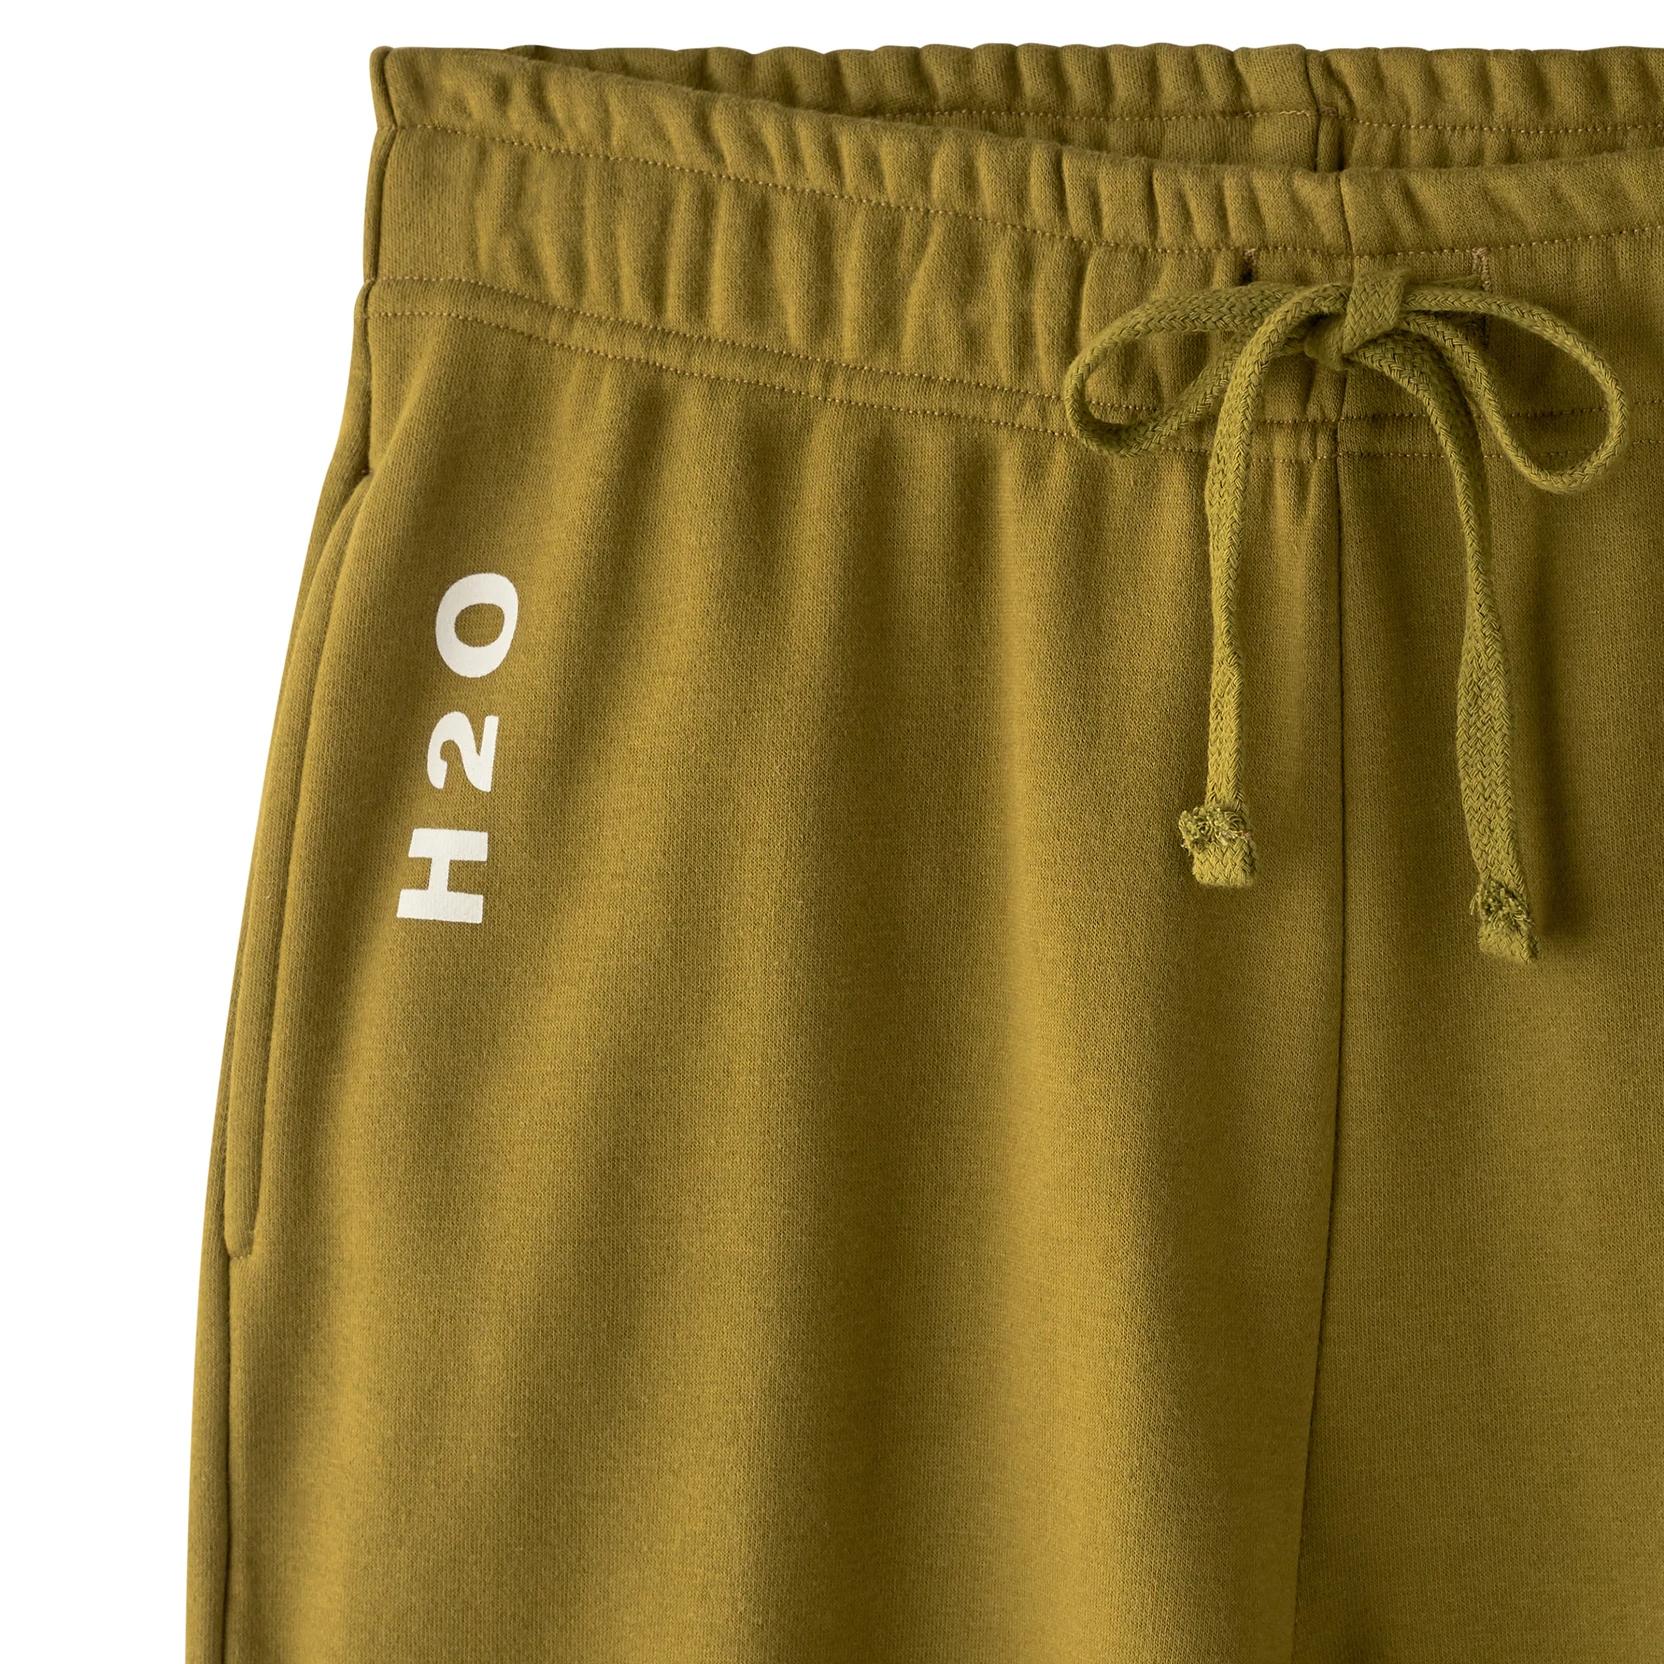 H2O Lolland sweatpants, army avocado, x-small